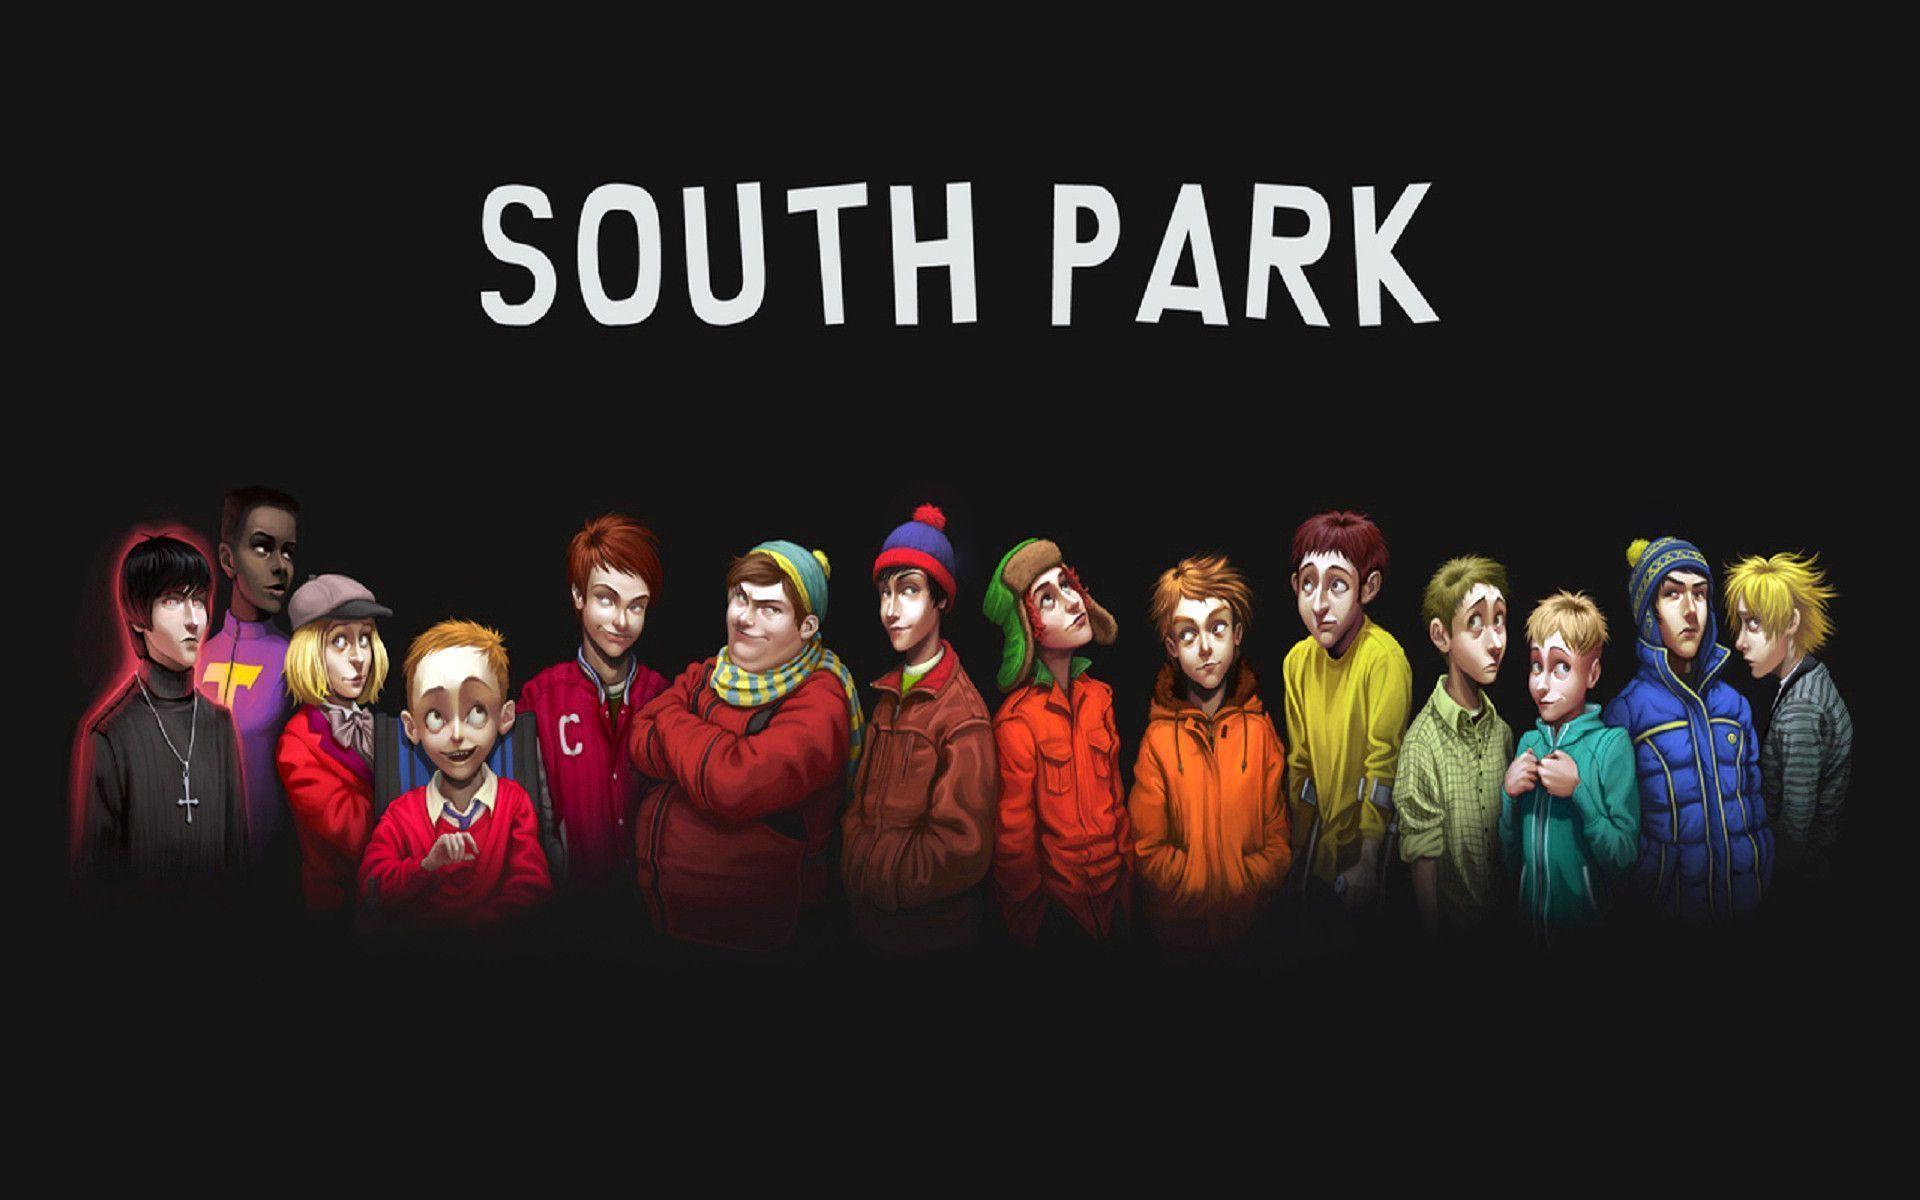 south park wallpapers for desktop - photo #6